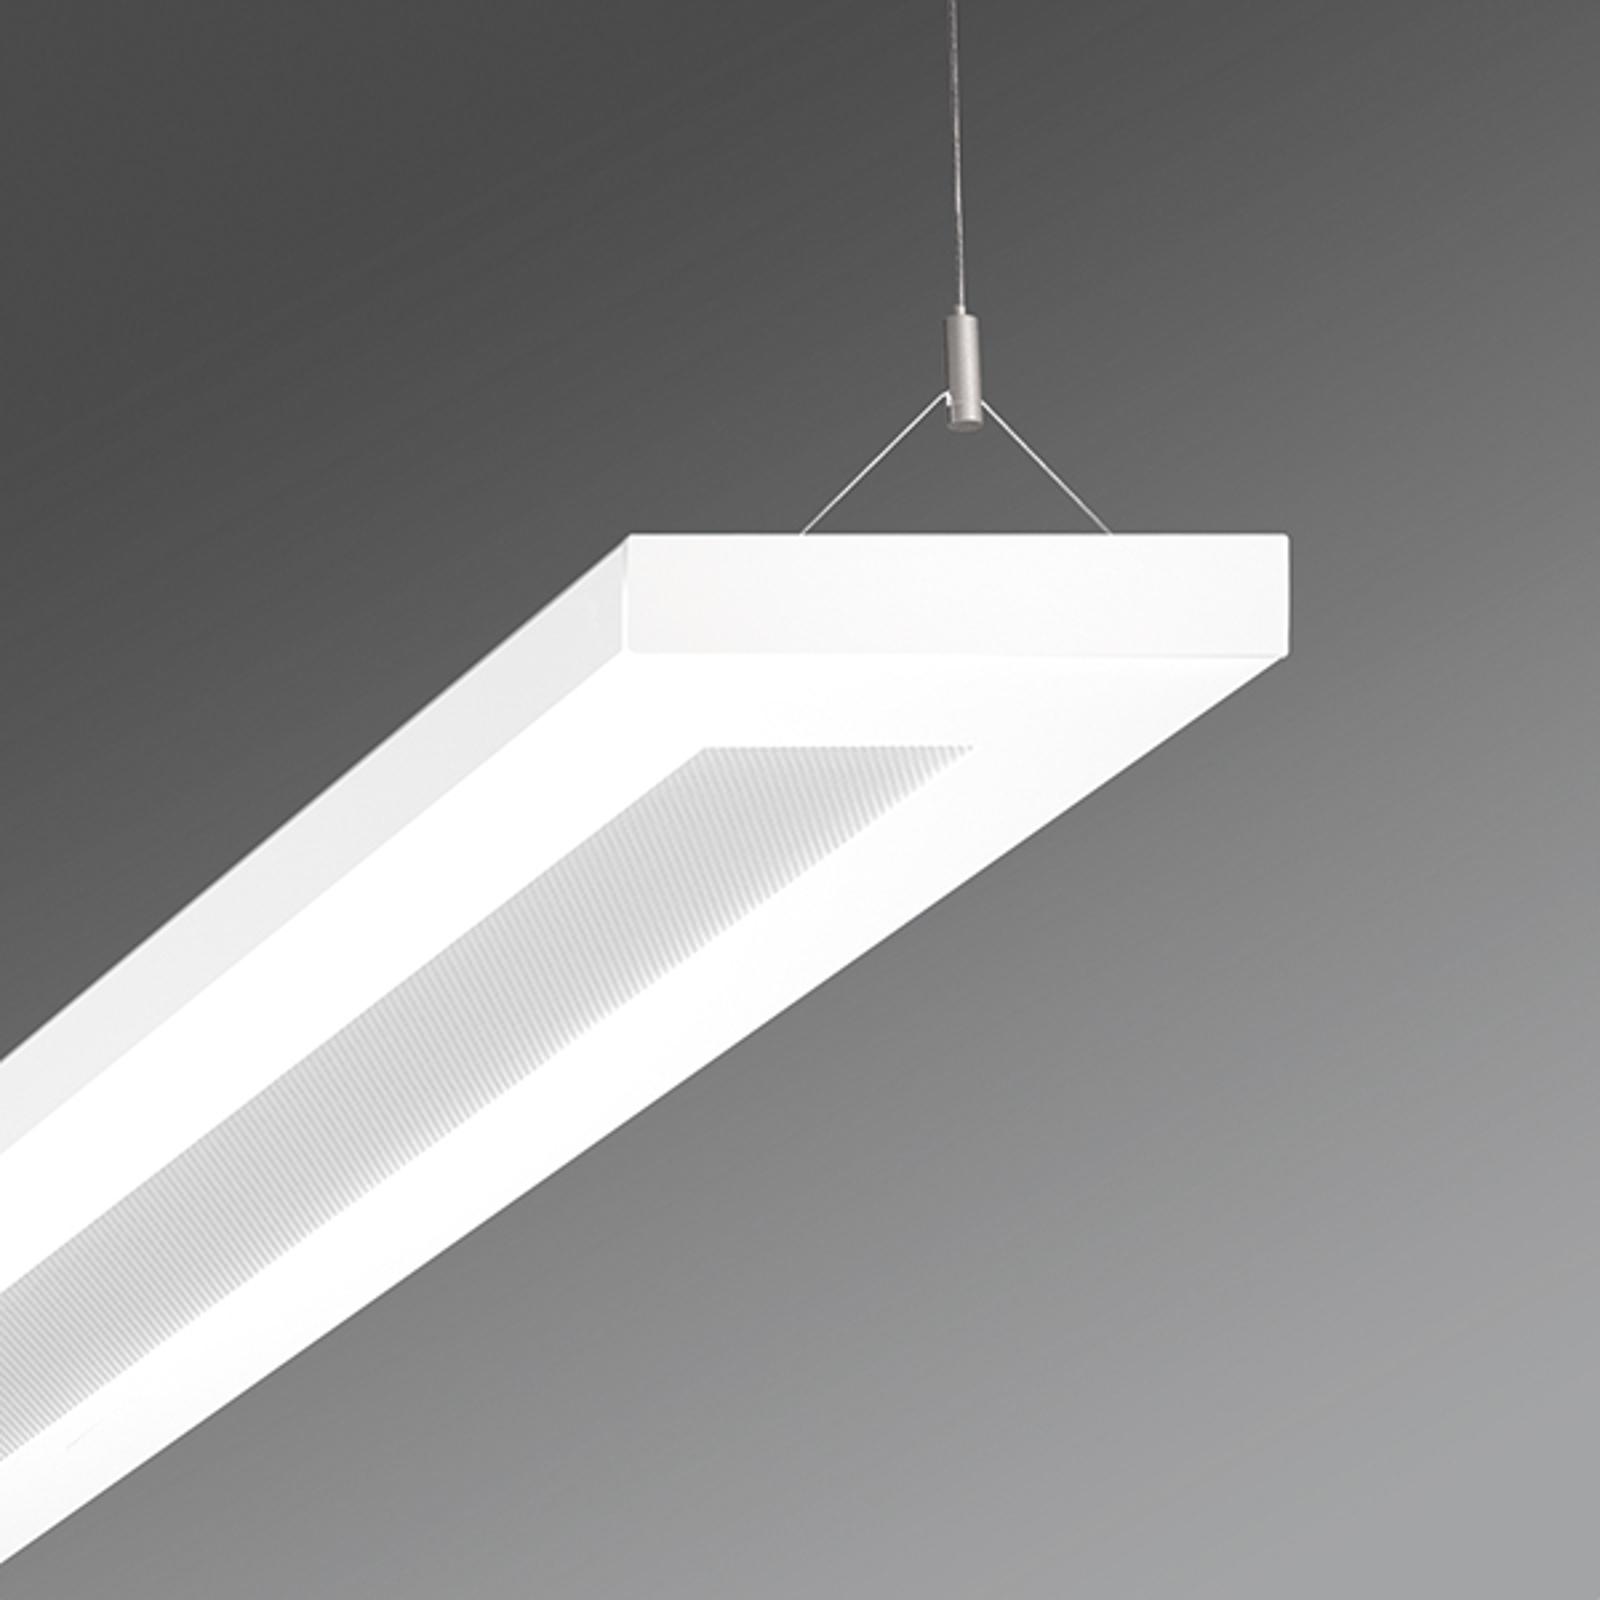 LED-pendellampe kontor Stail mikroprisma LED 32 W